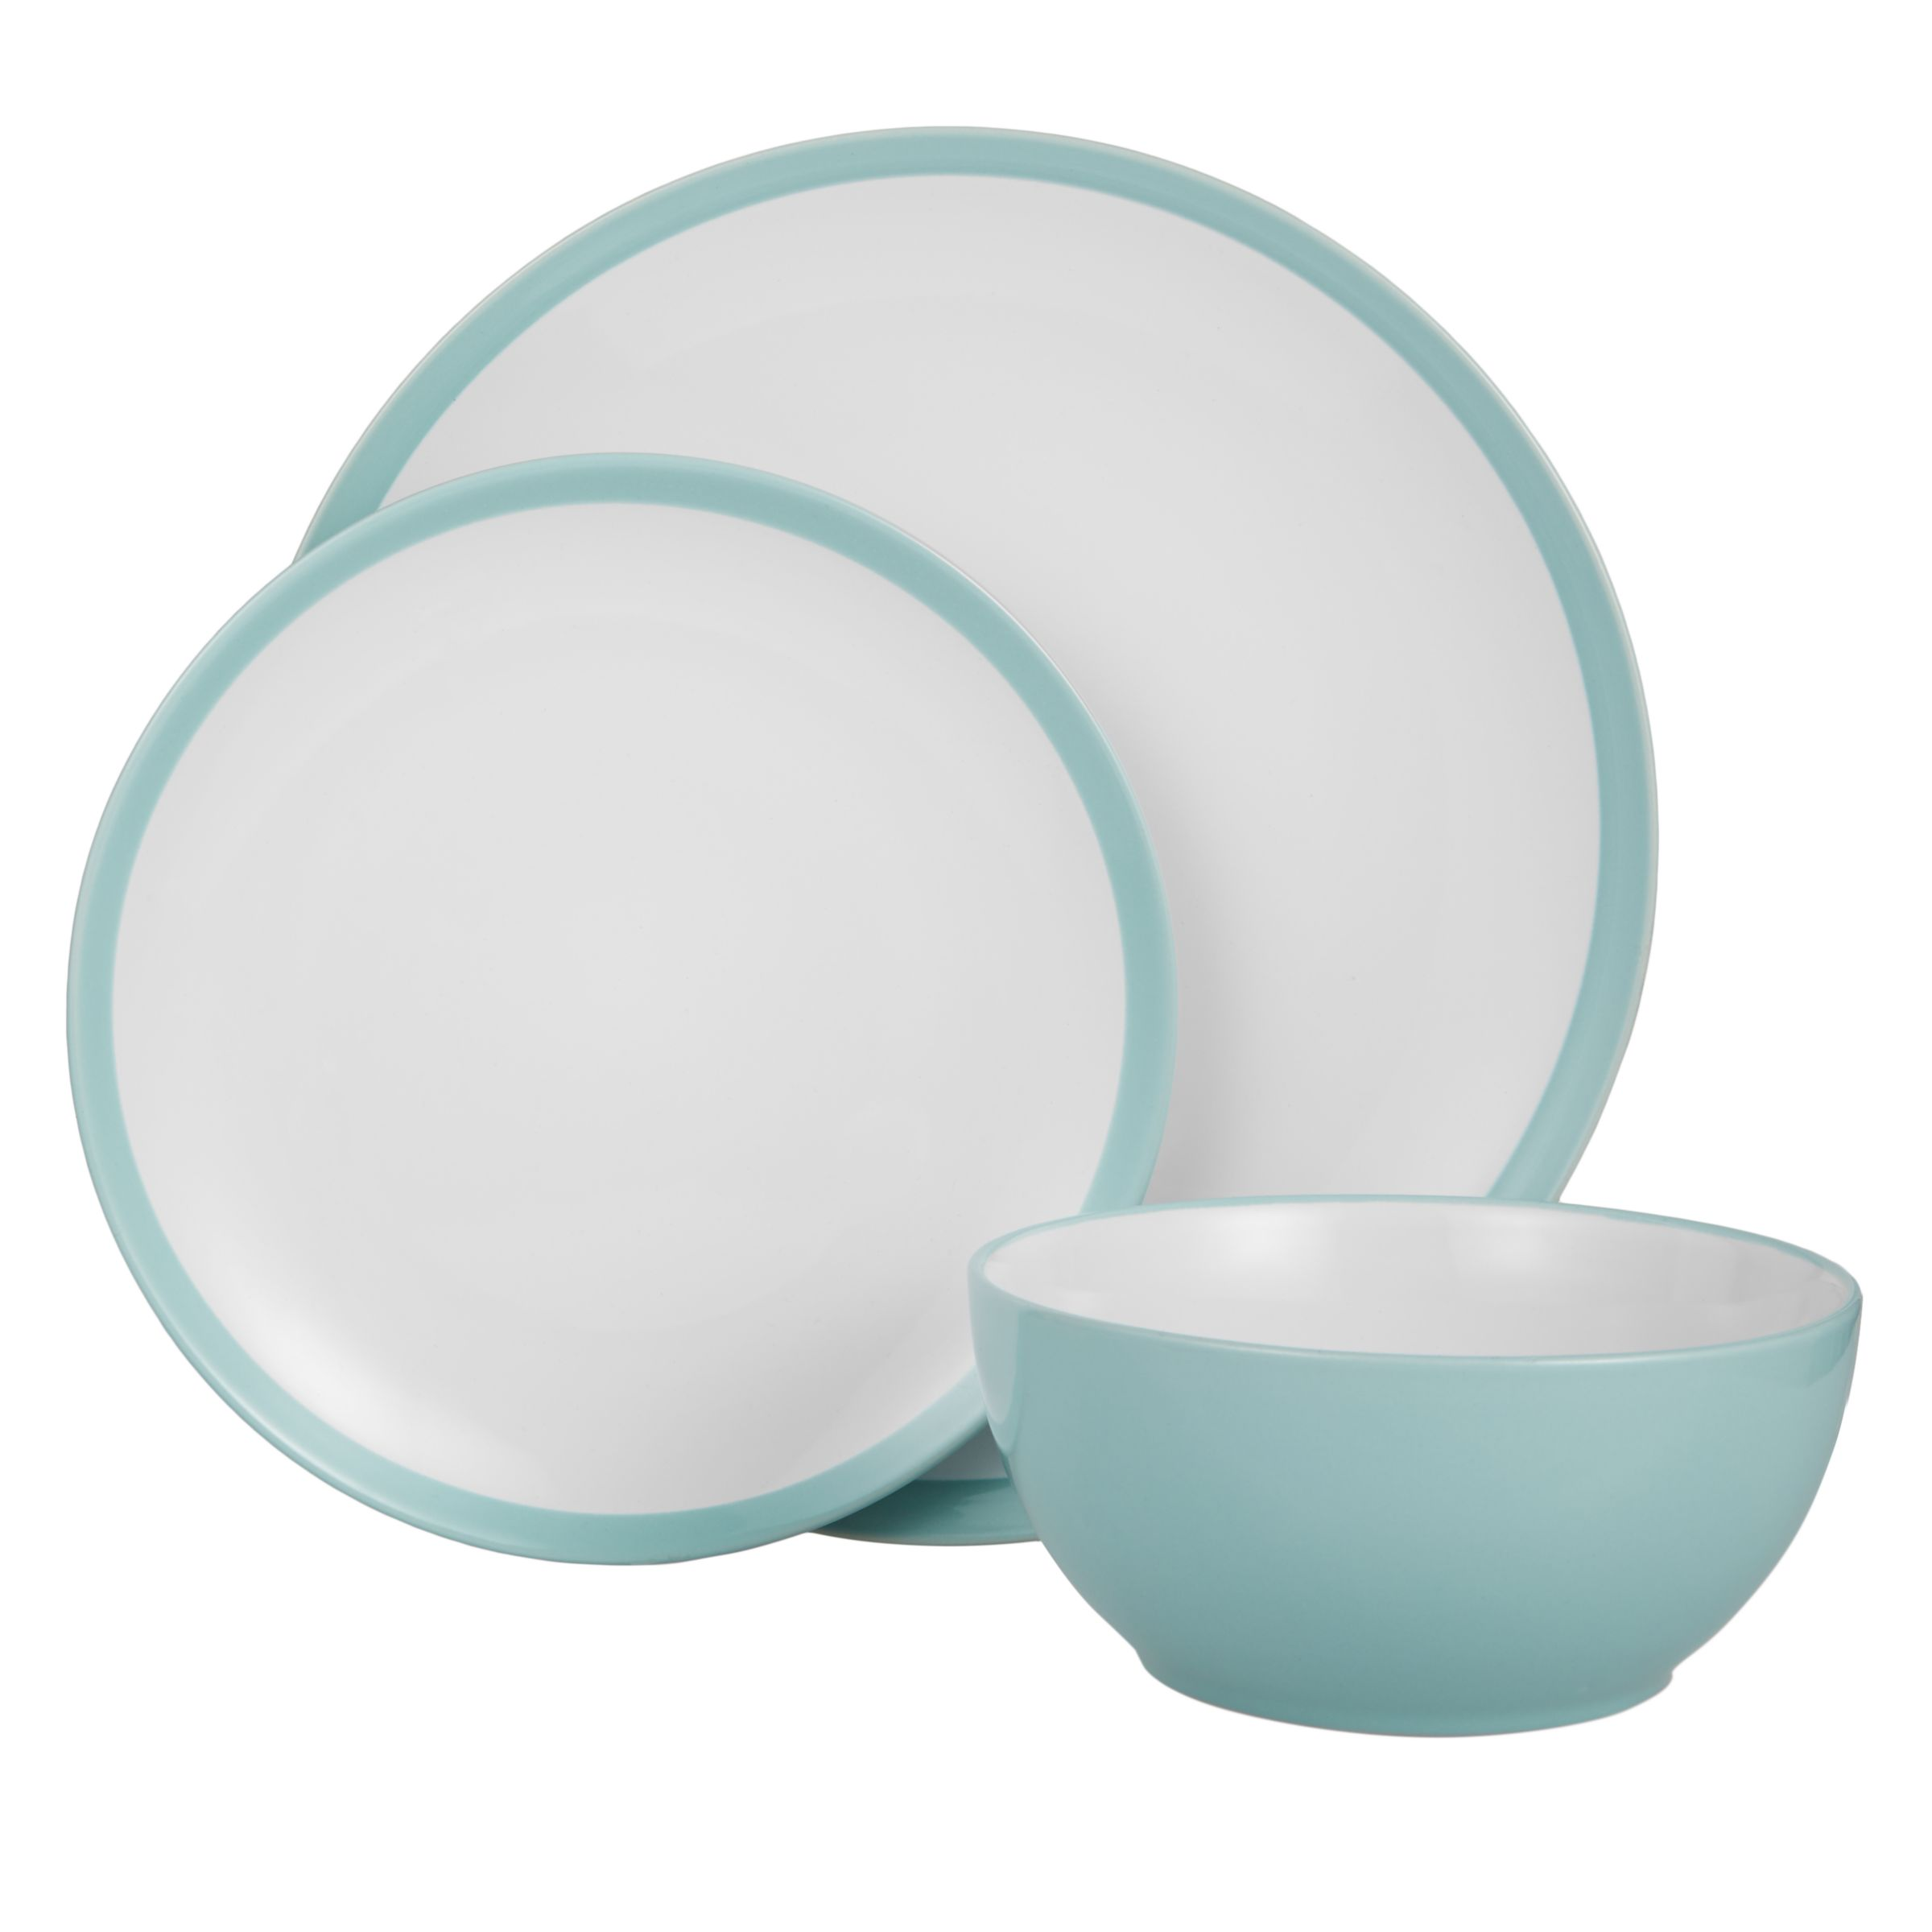 John Lewis & Partners The Basics China Dinnerware Set, 12 Piece at ...